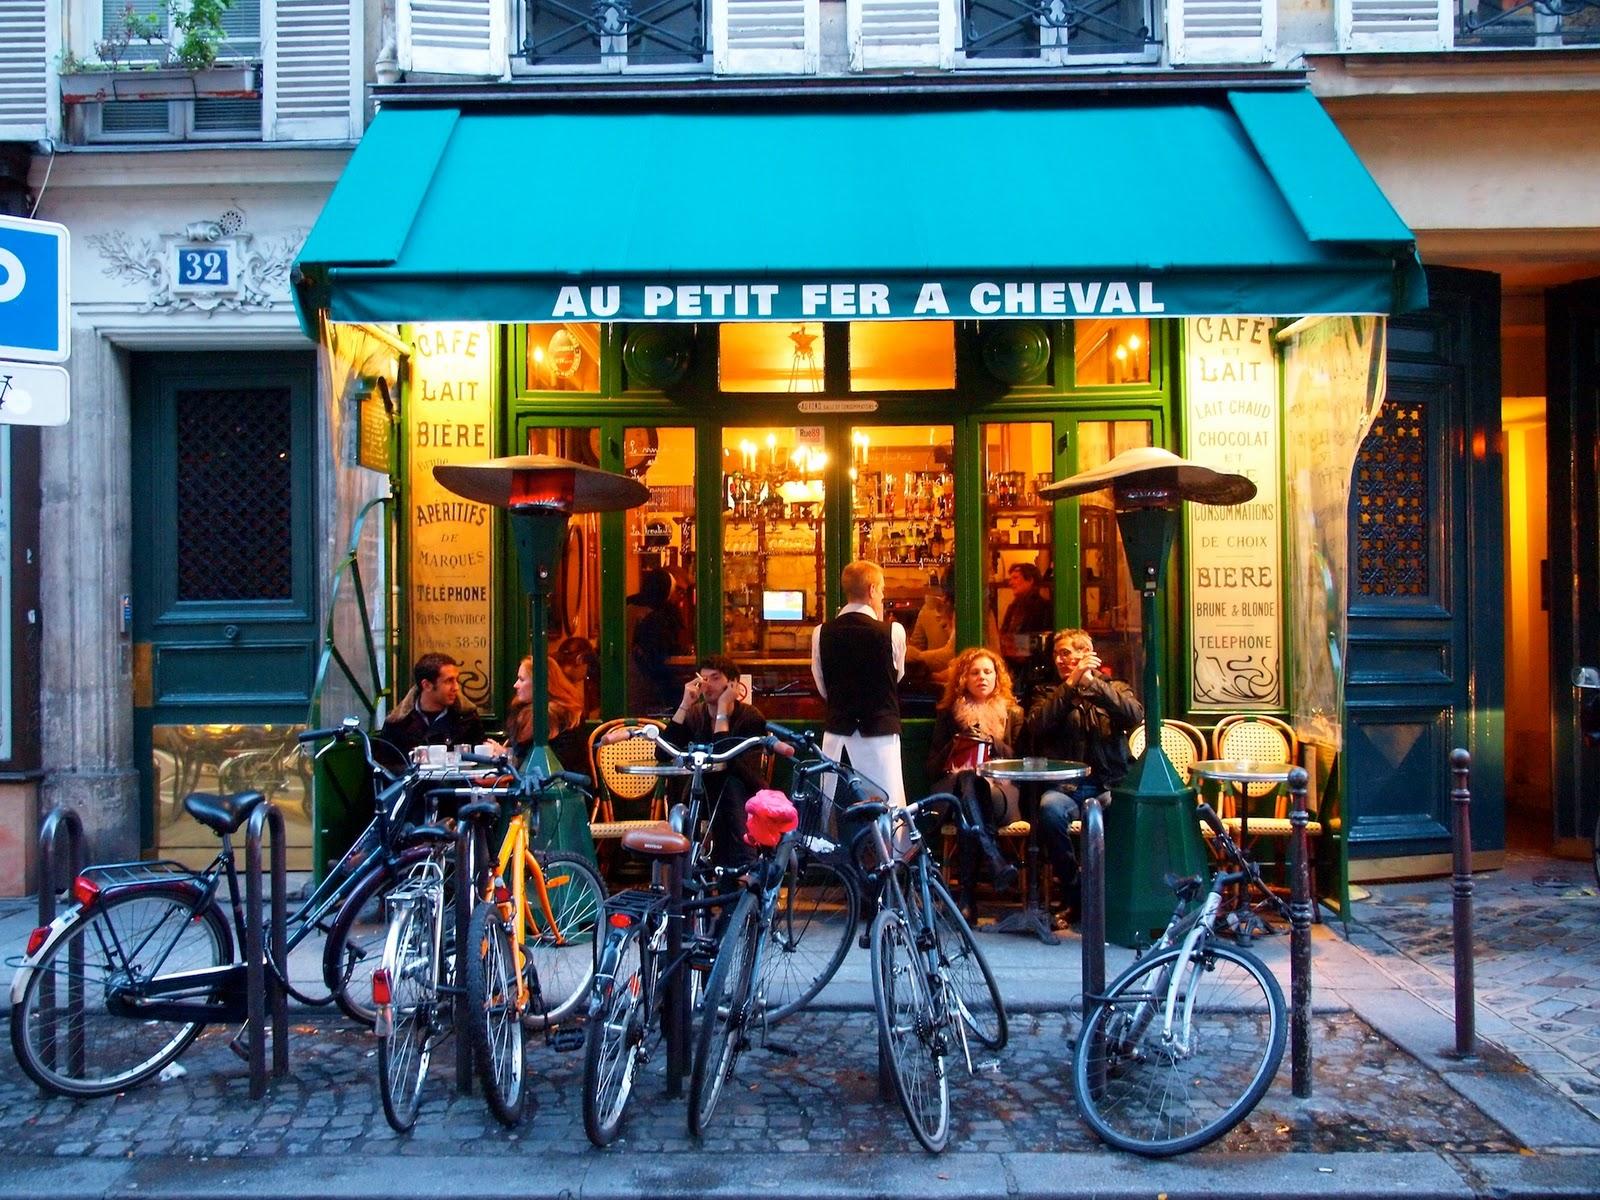 Woof Paris Street Cafe Wallpaper   mario brosscom 1600x1200